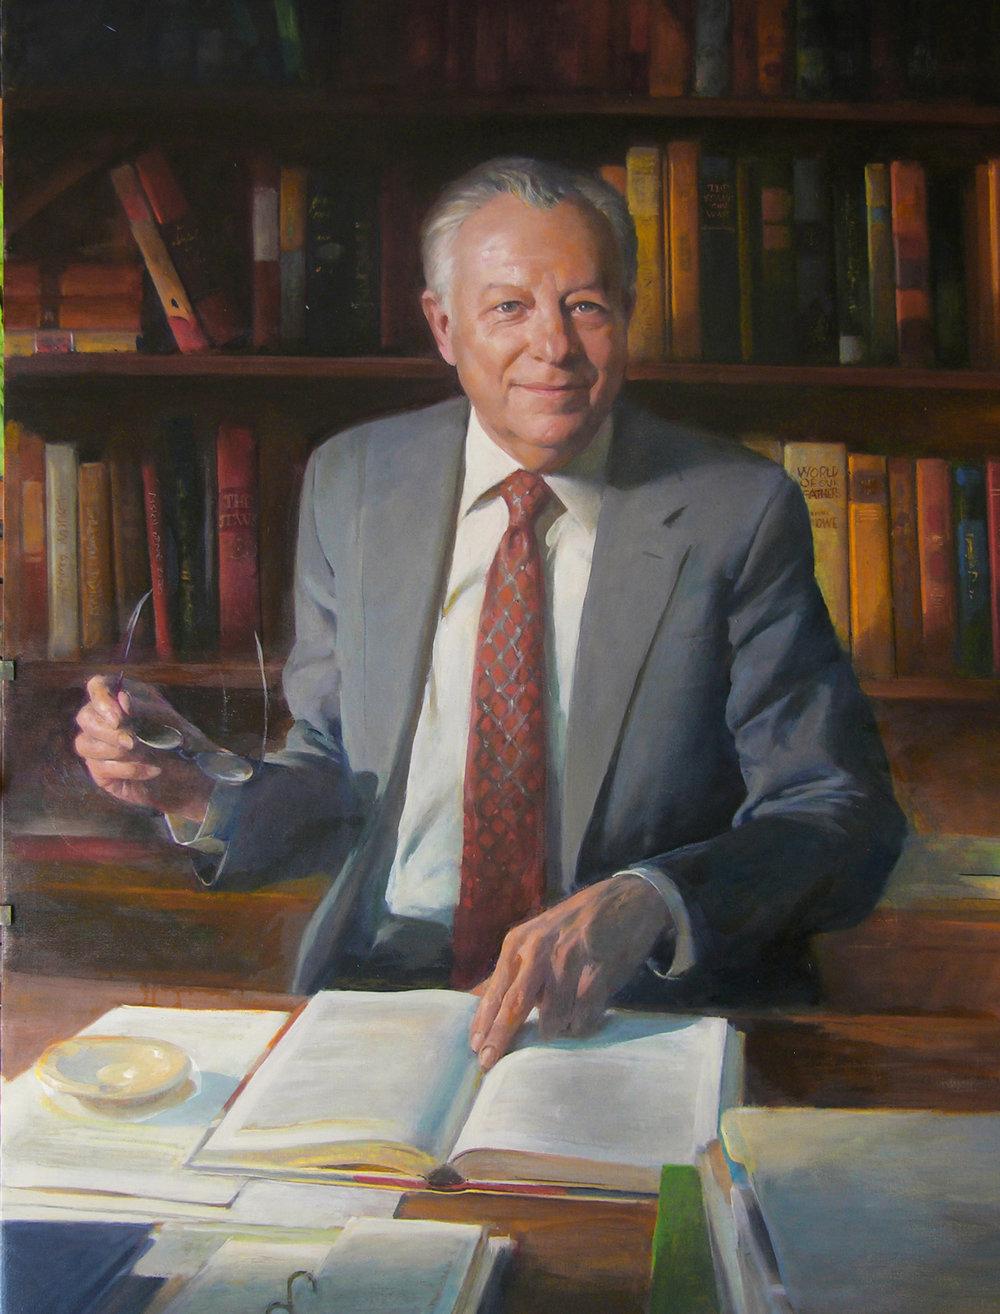 Irving Kristol, 2014